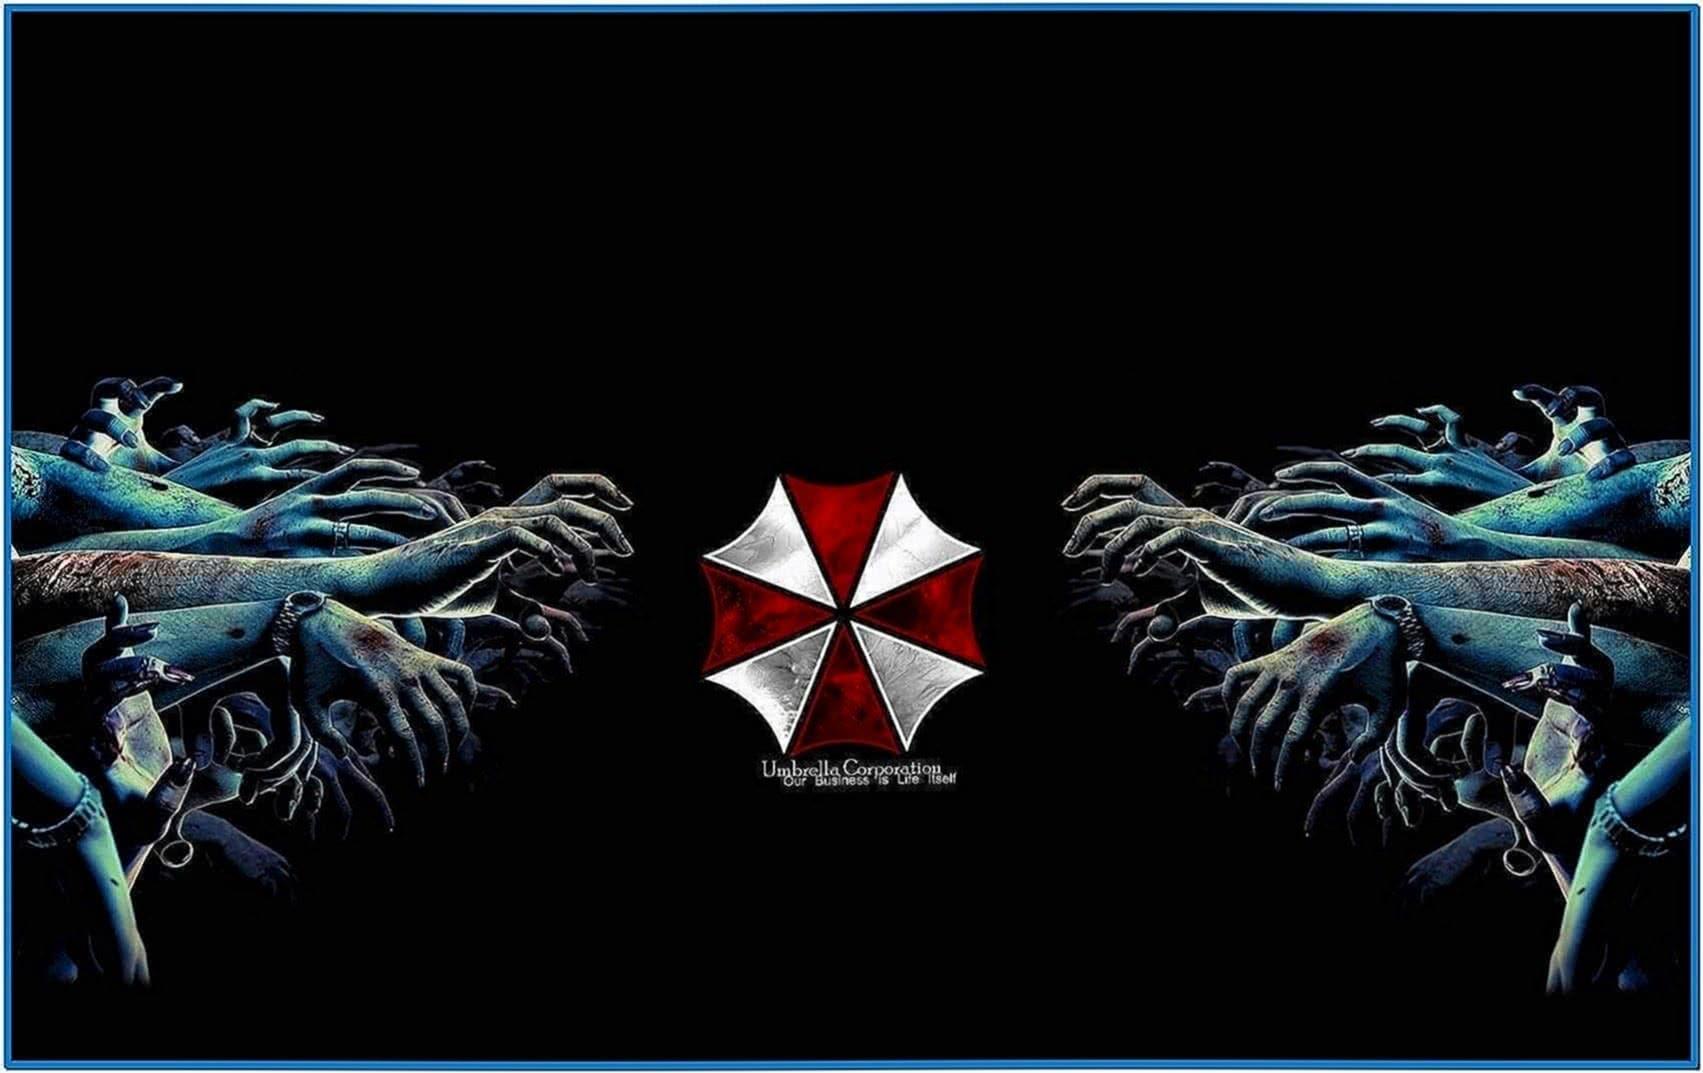 Umbrella corporation screensaver zombiesUmbrella Corporation Zombies